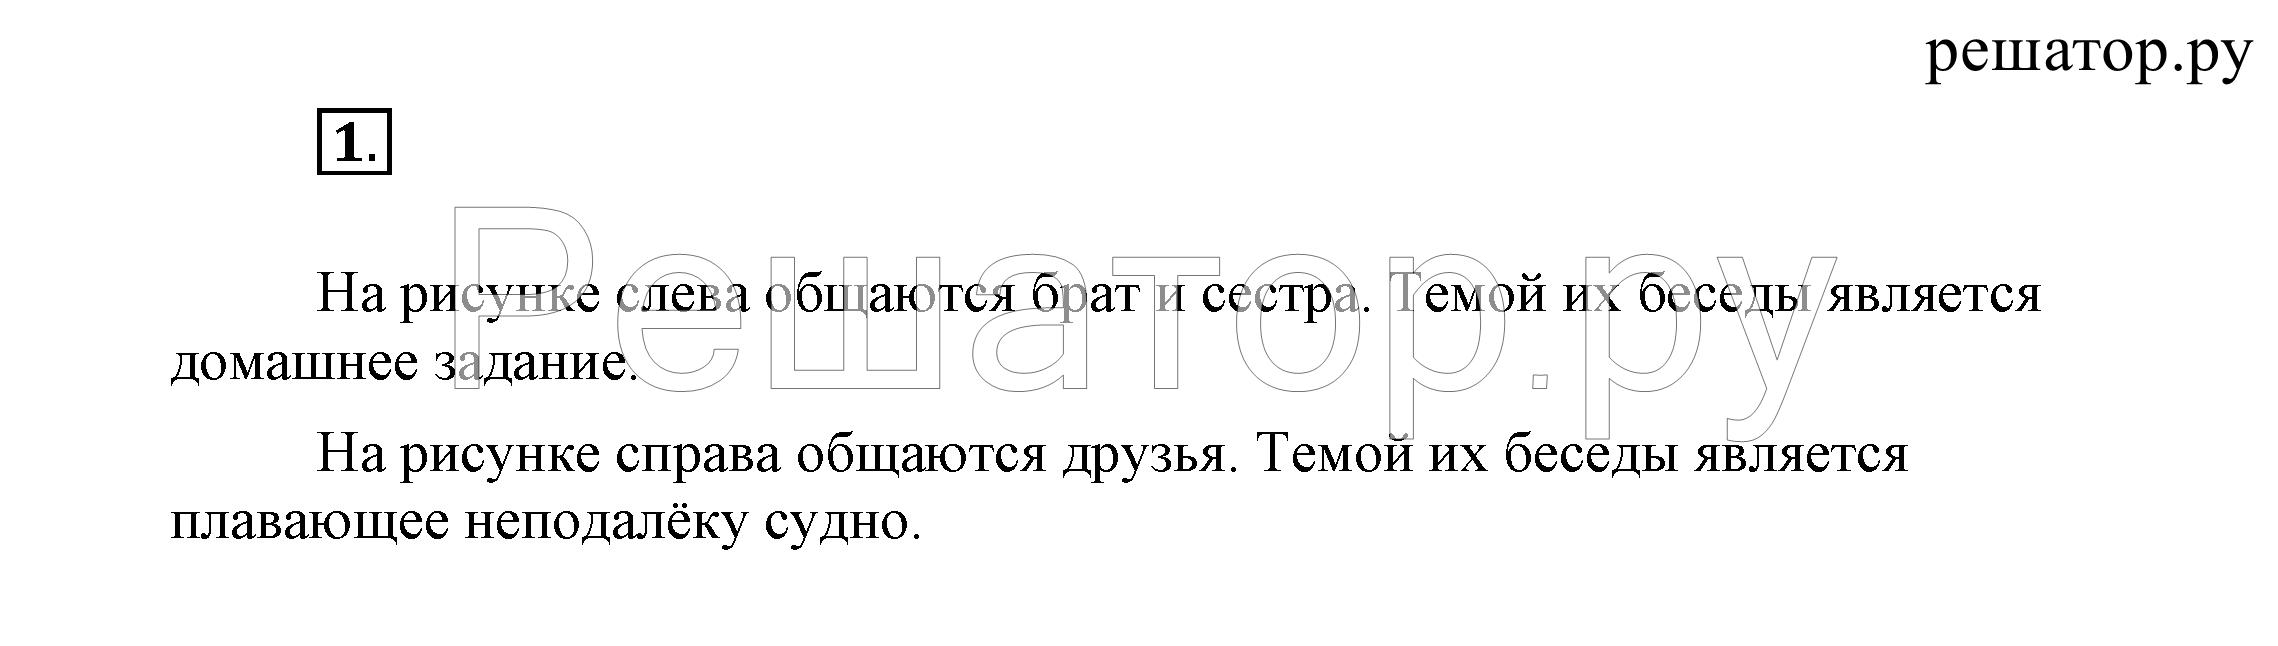 1 - решебник №3